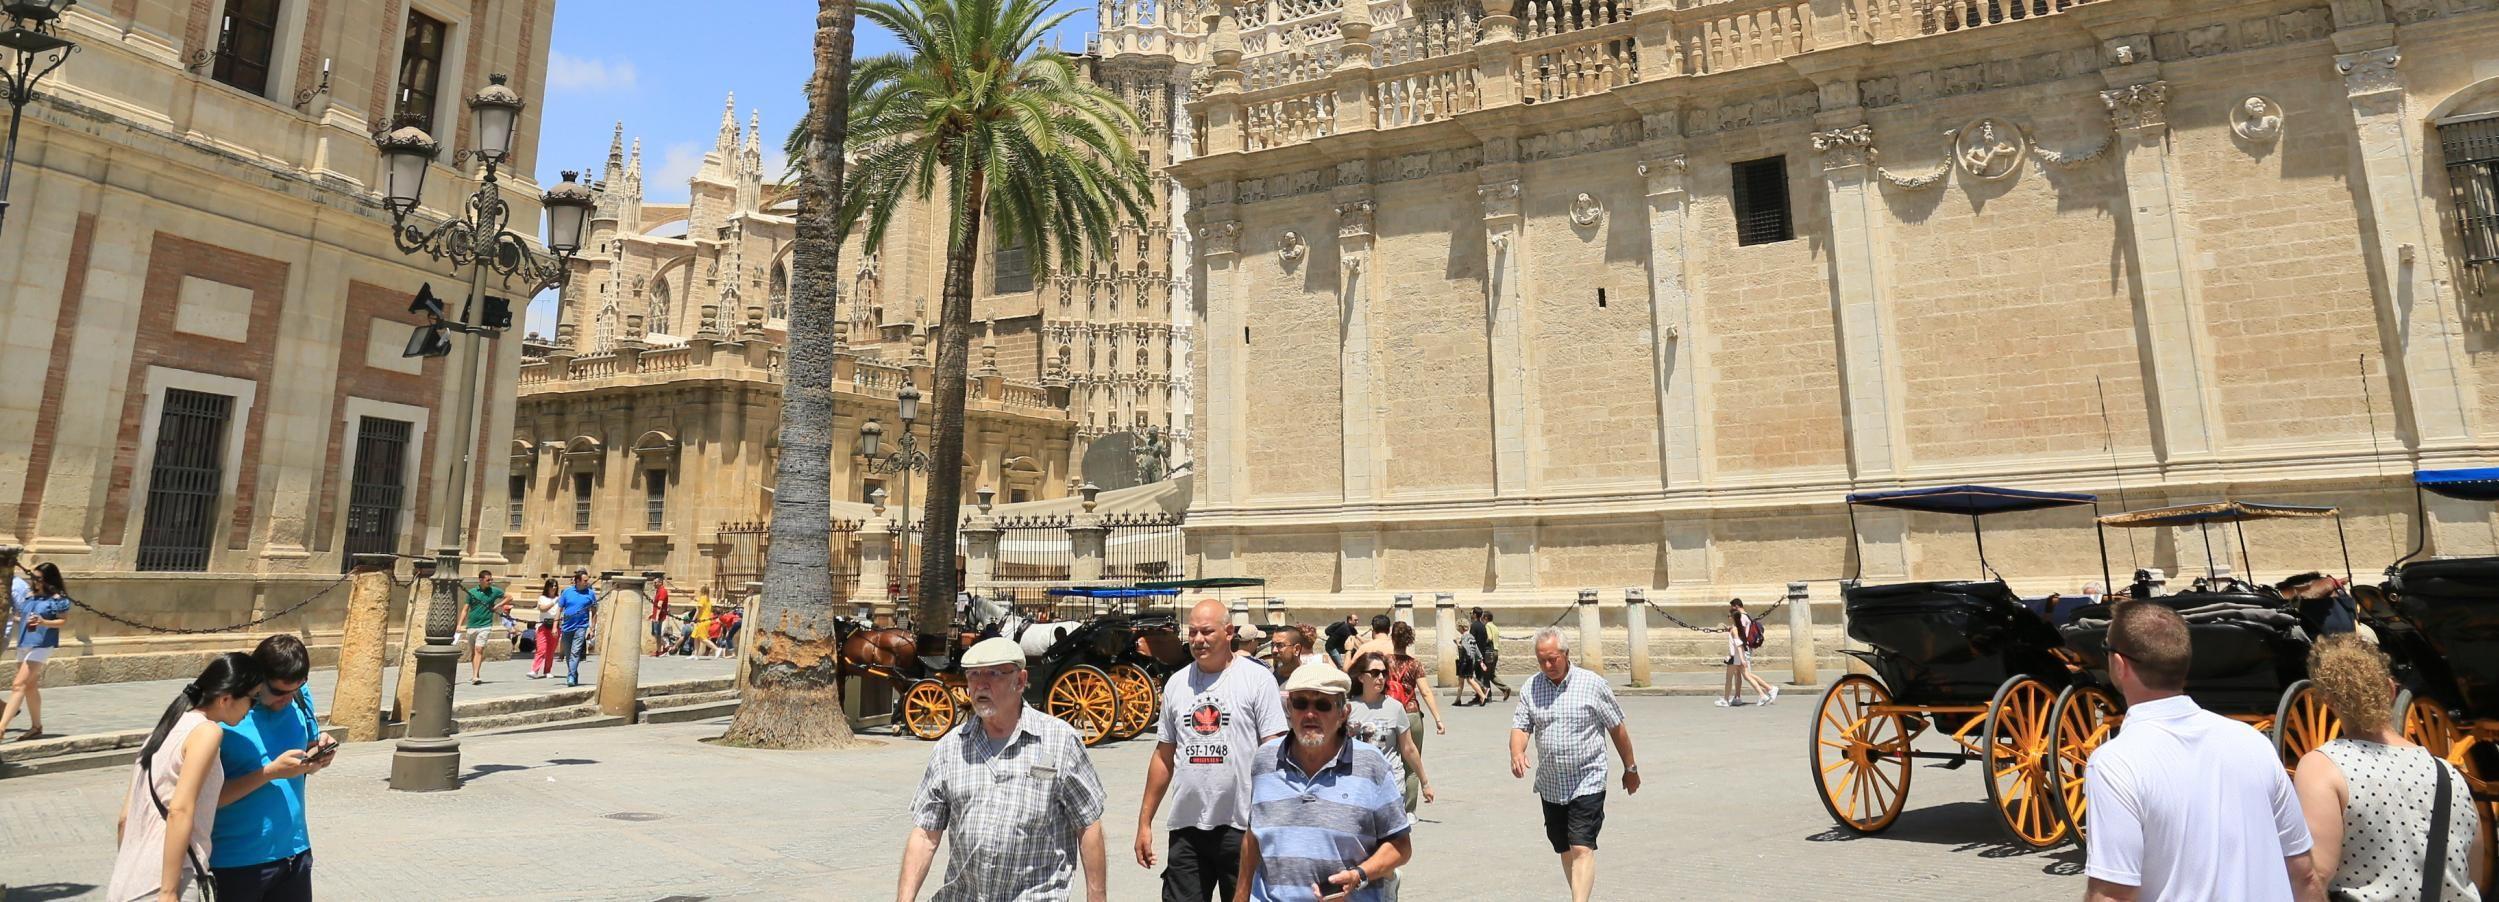 Sevilla: Stadtrundgang